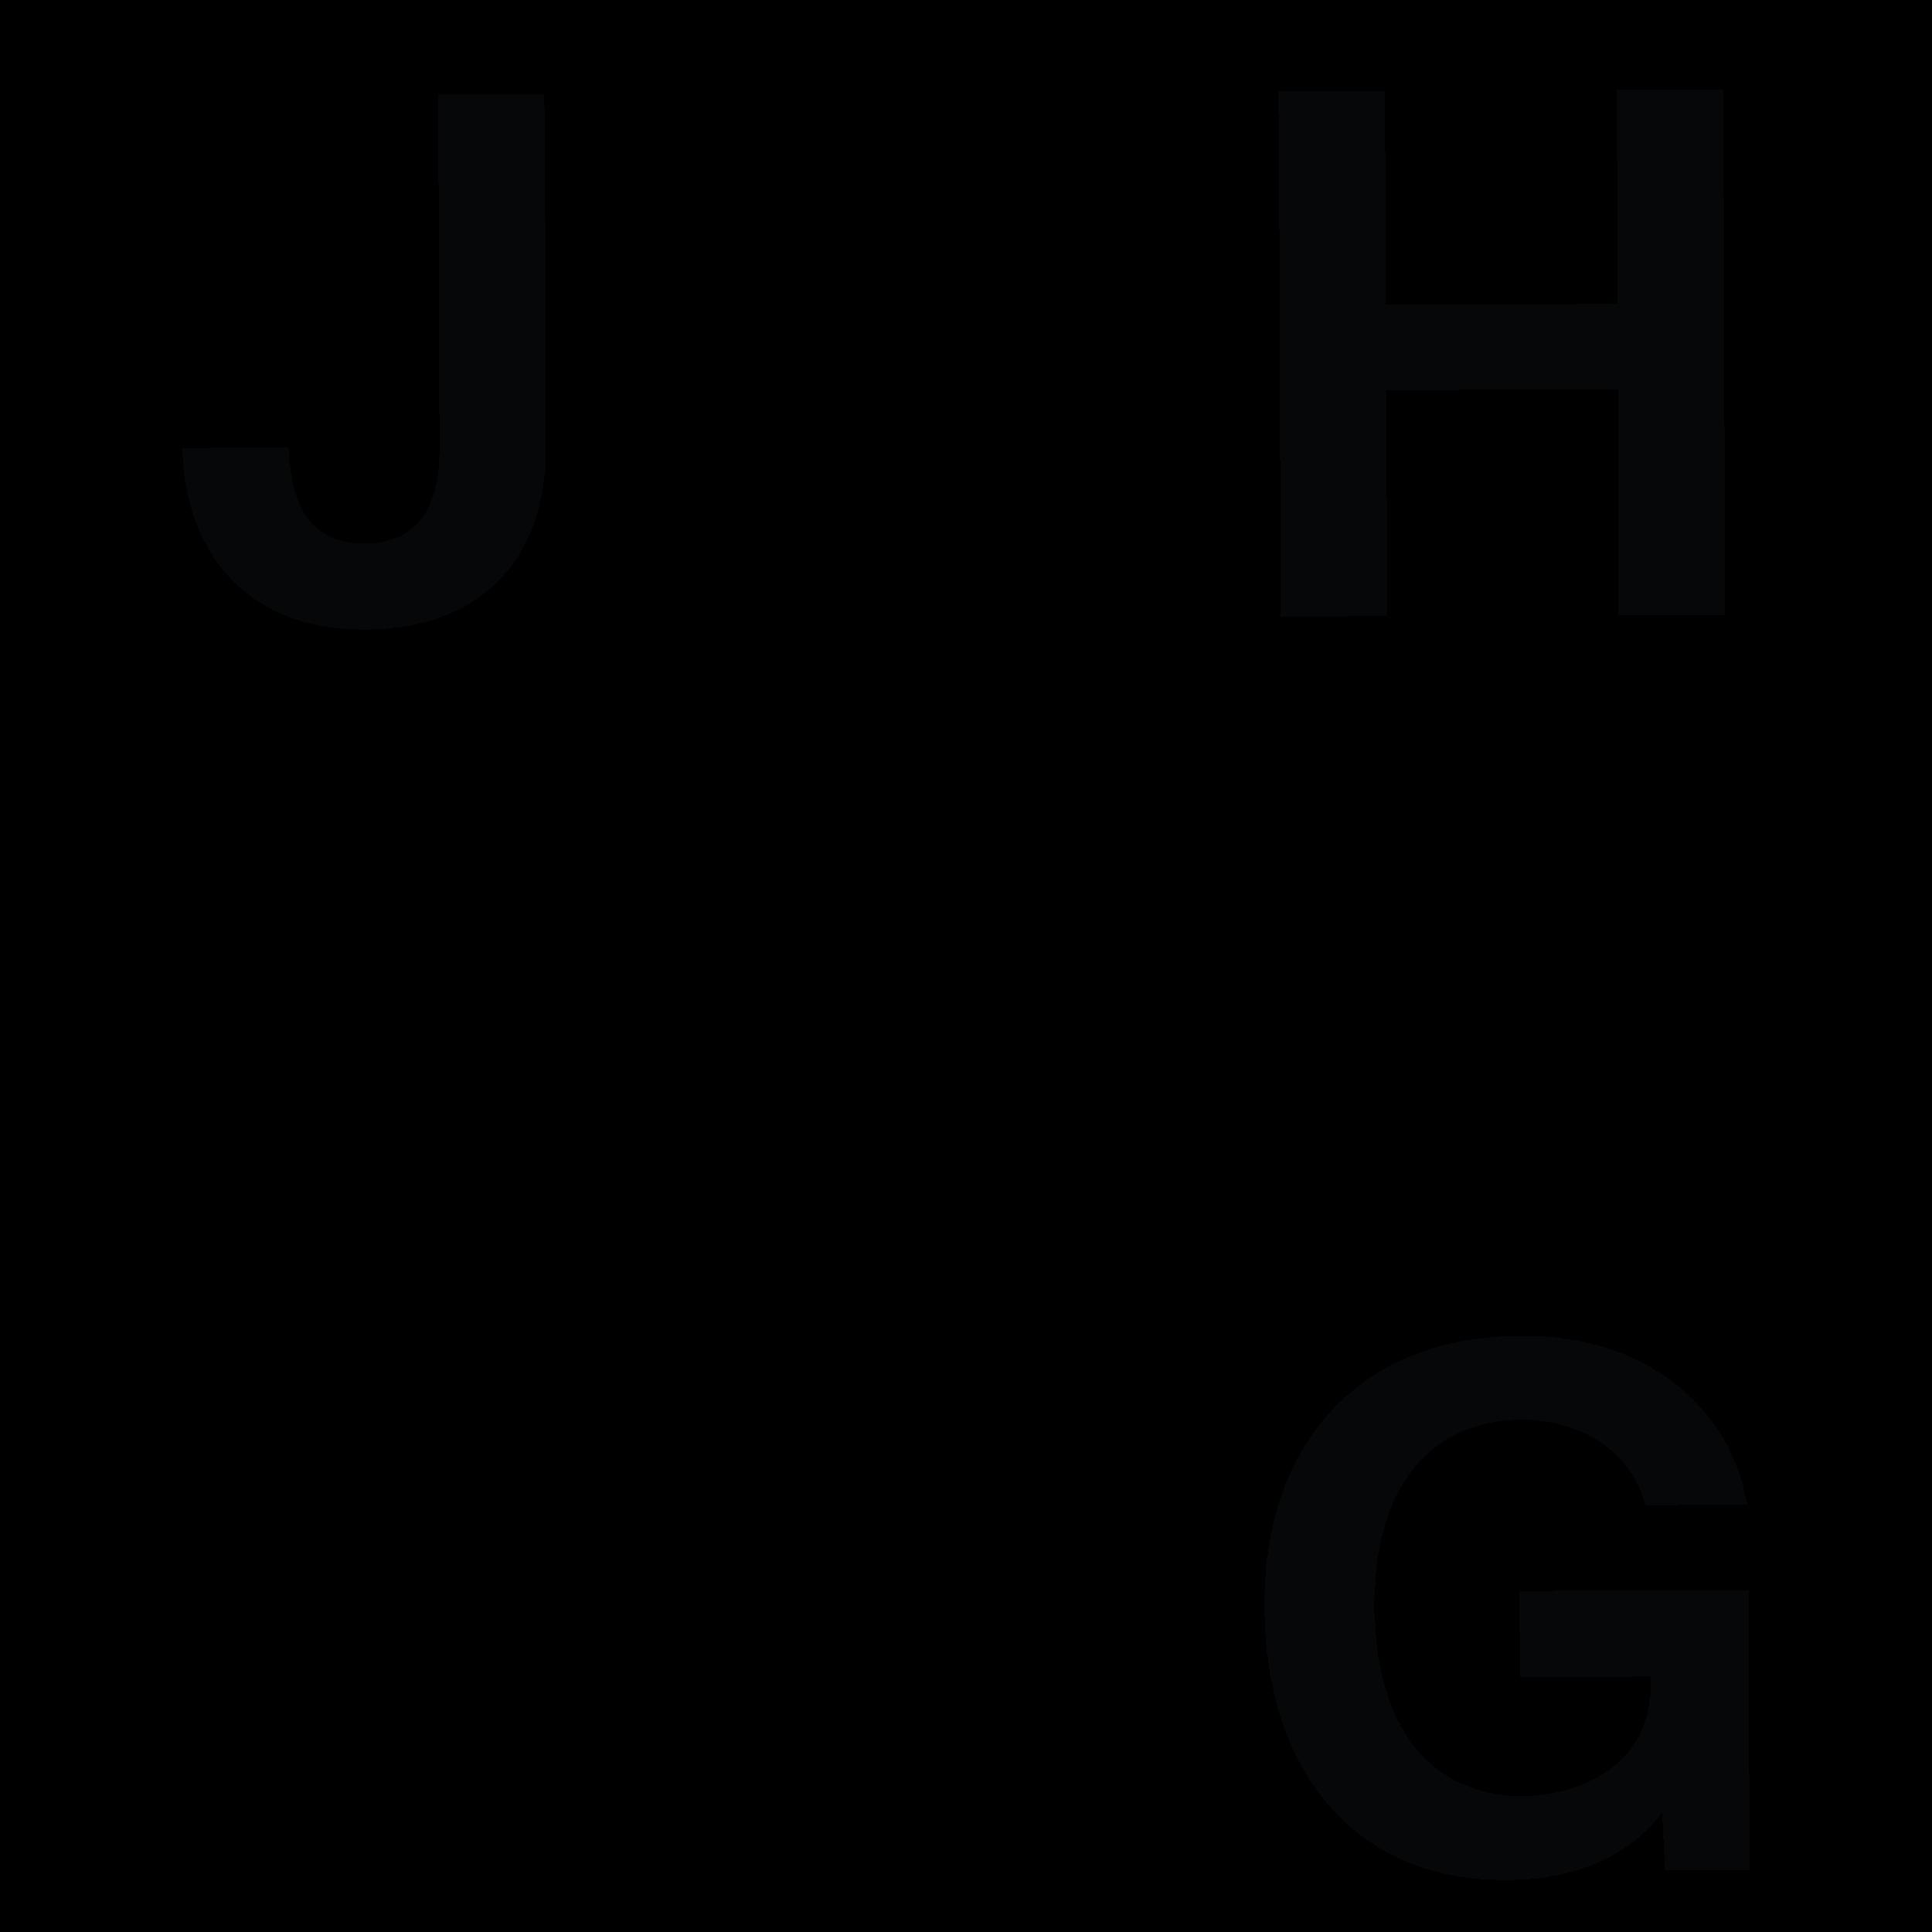 JHG-01.png